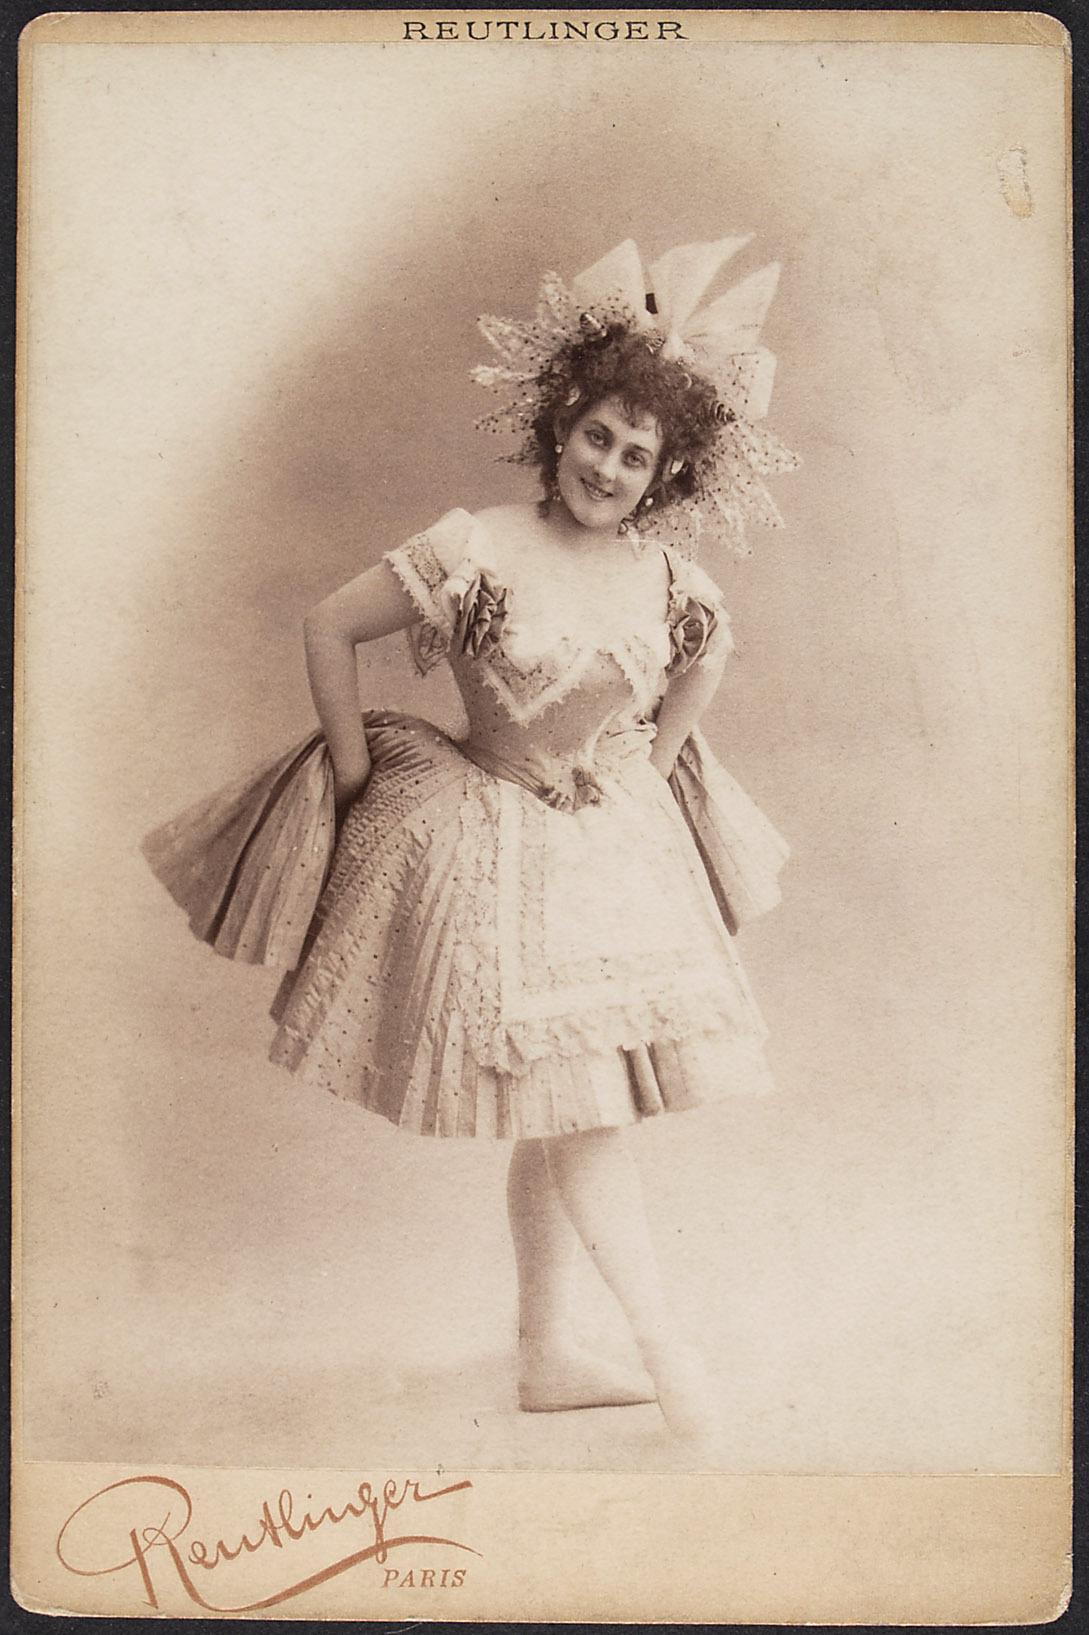 Marie de Labounskaya von Reutlinger, Paris